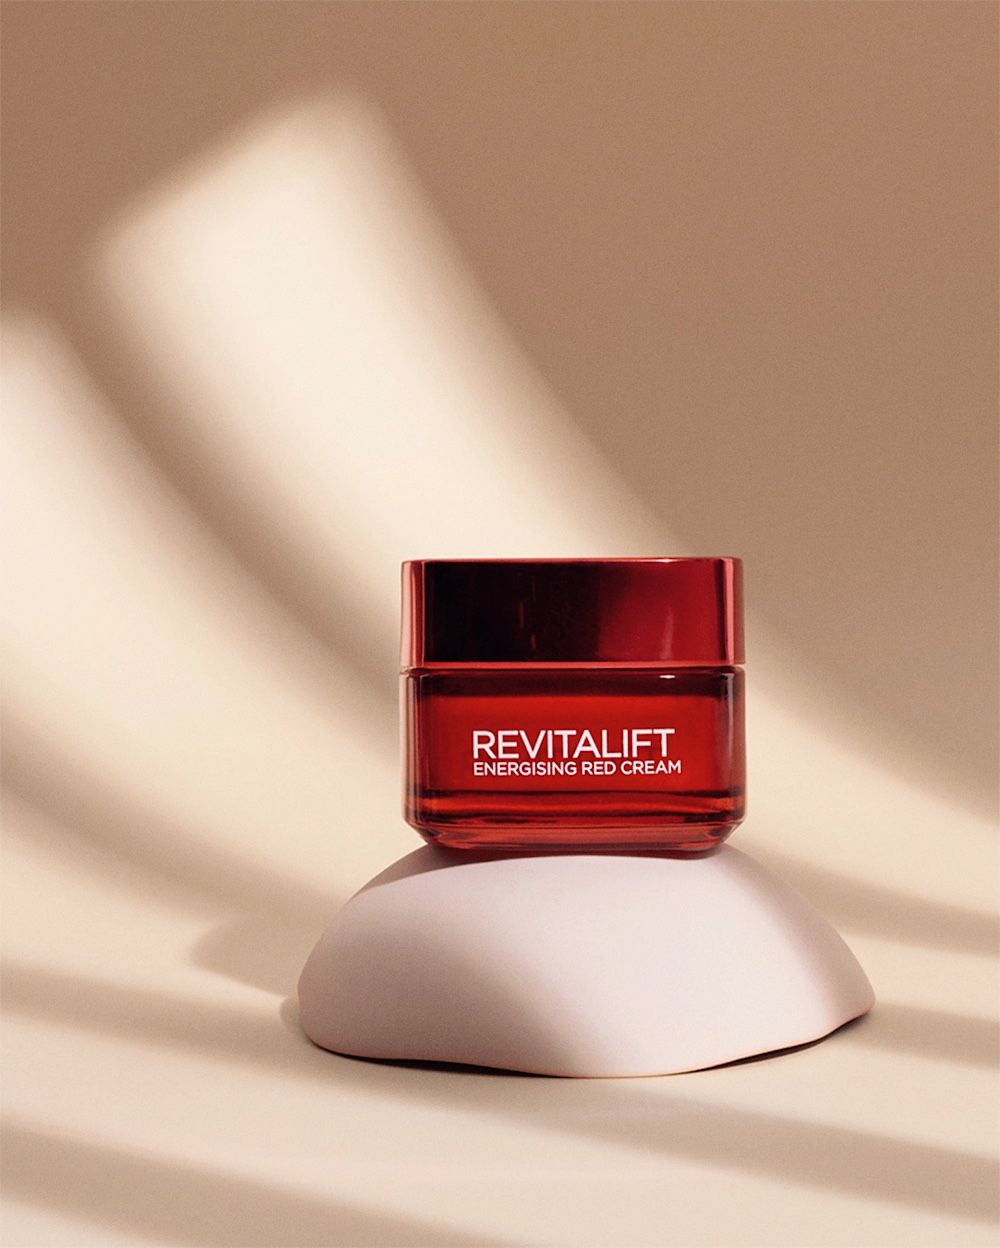 LOP Revitalift Red Cream